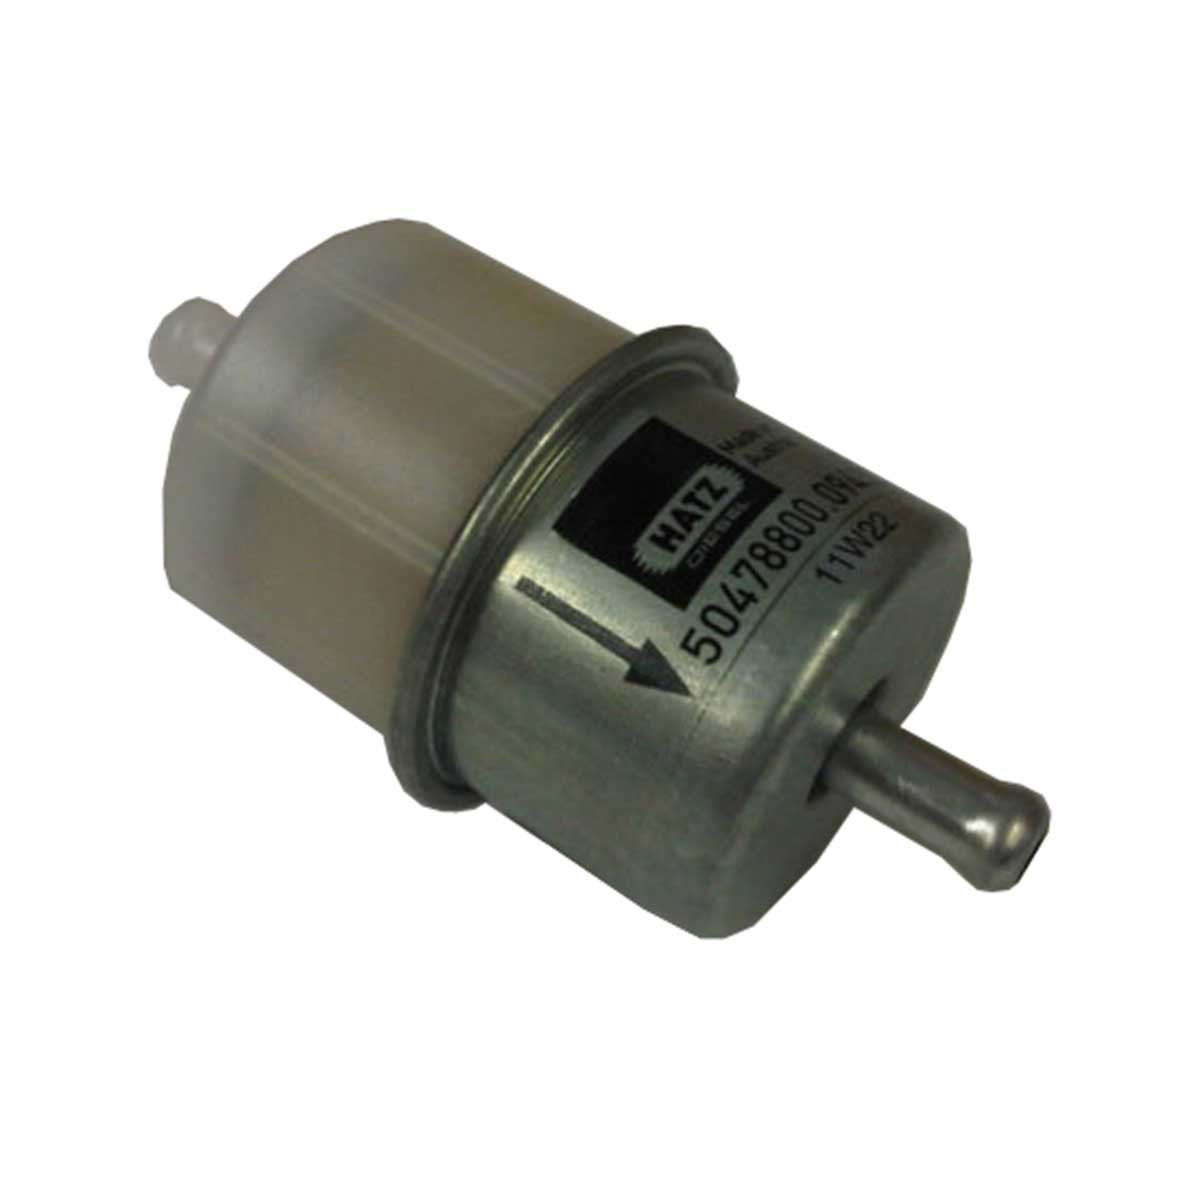 Wacker Hatz 50478800 1D30/90 Diesel